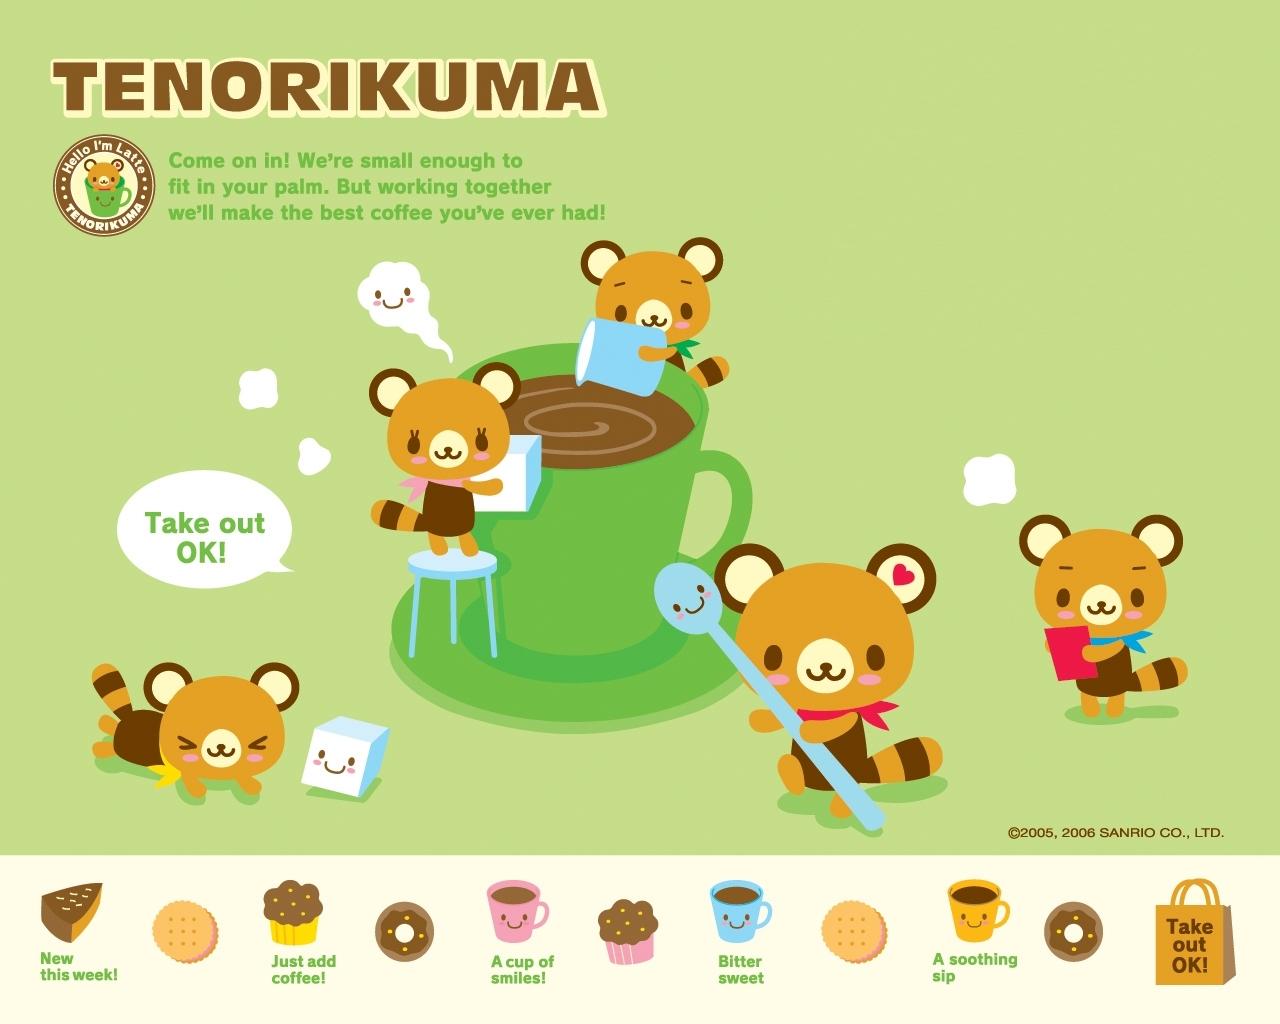 http://3.bp.blogspot.com/-CGgASg17SIo/T7Mn_TT9ffI/AAAAAAAAB4w/FvsfCJ9UN4g/s1600/Tenorikuma-Wallpaper-sanrio-2712704-1280-1024.jpg